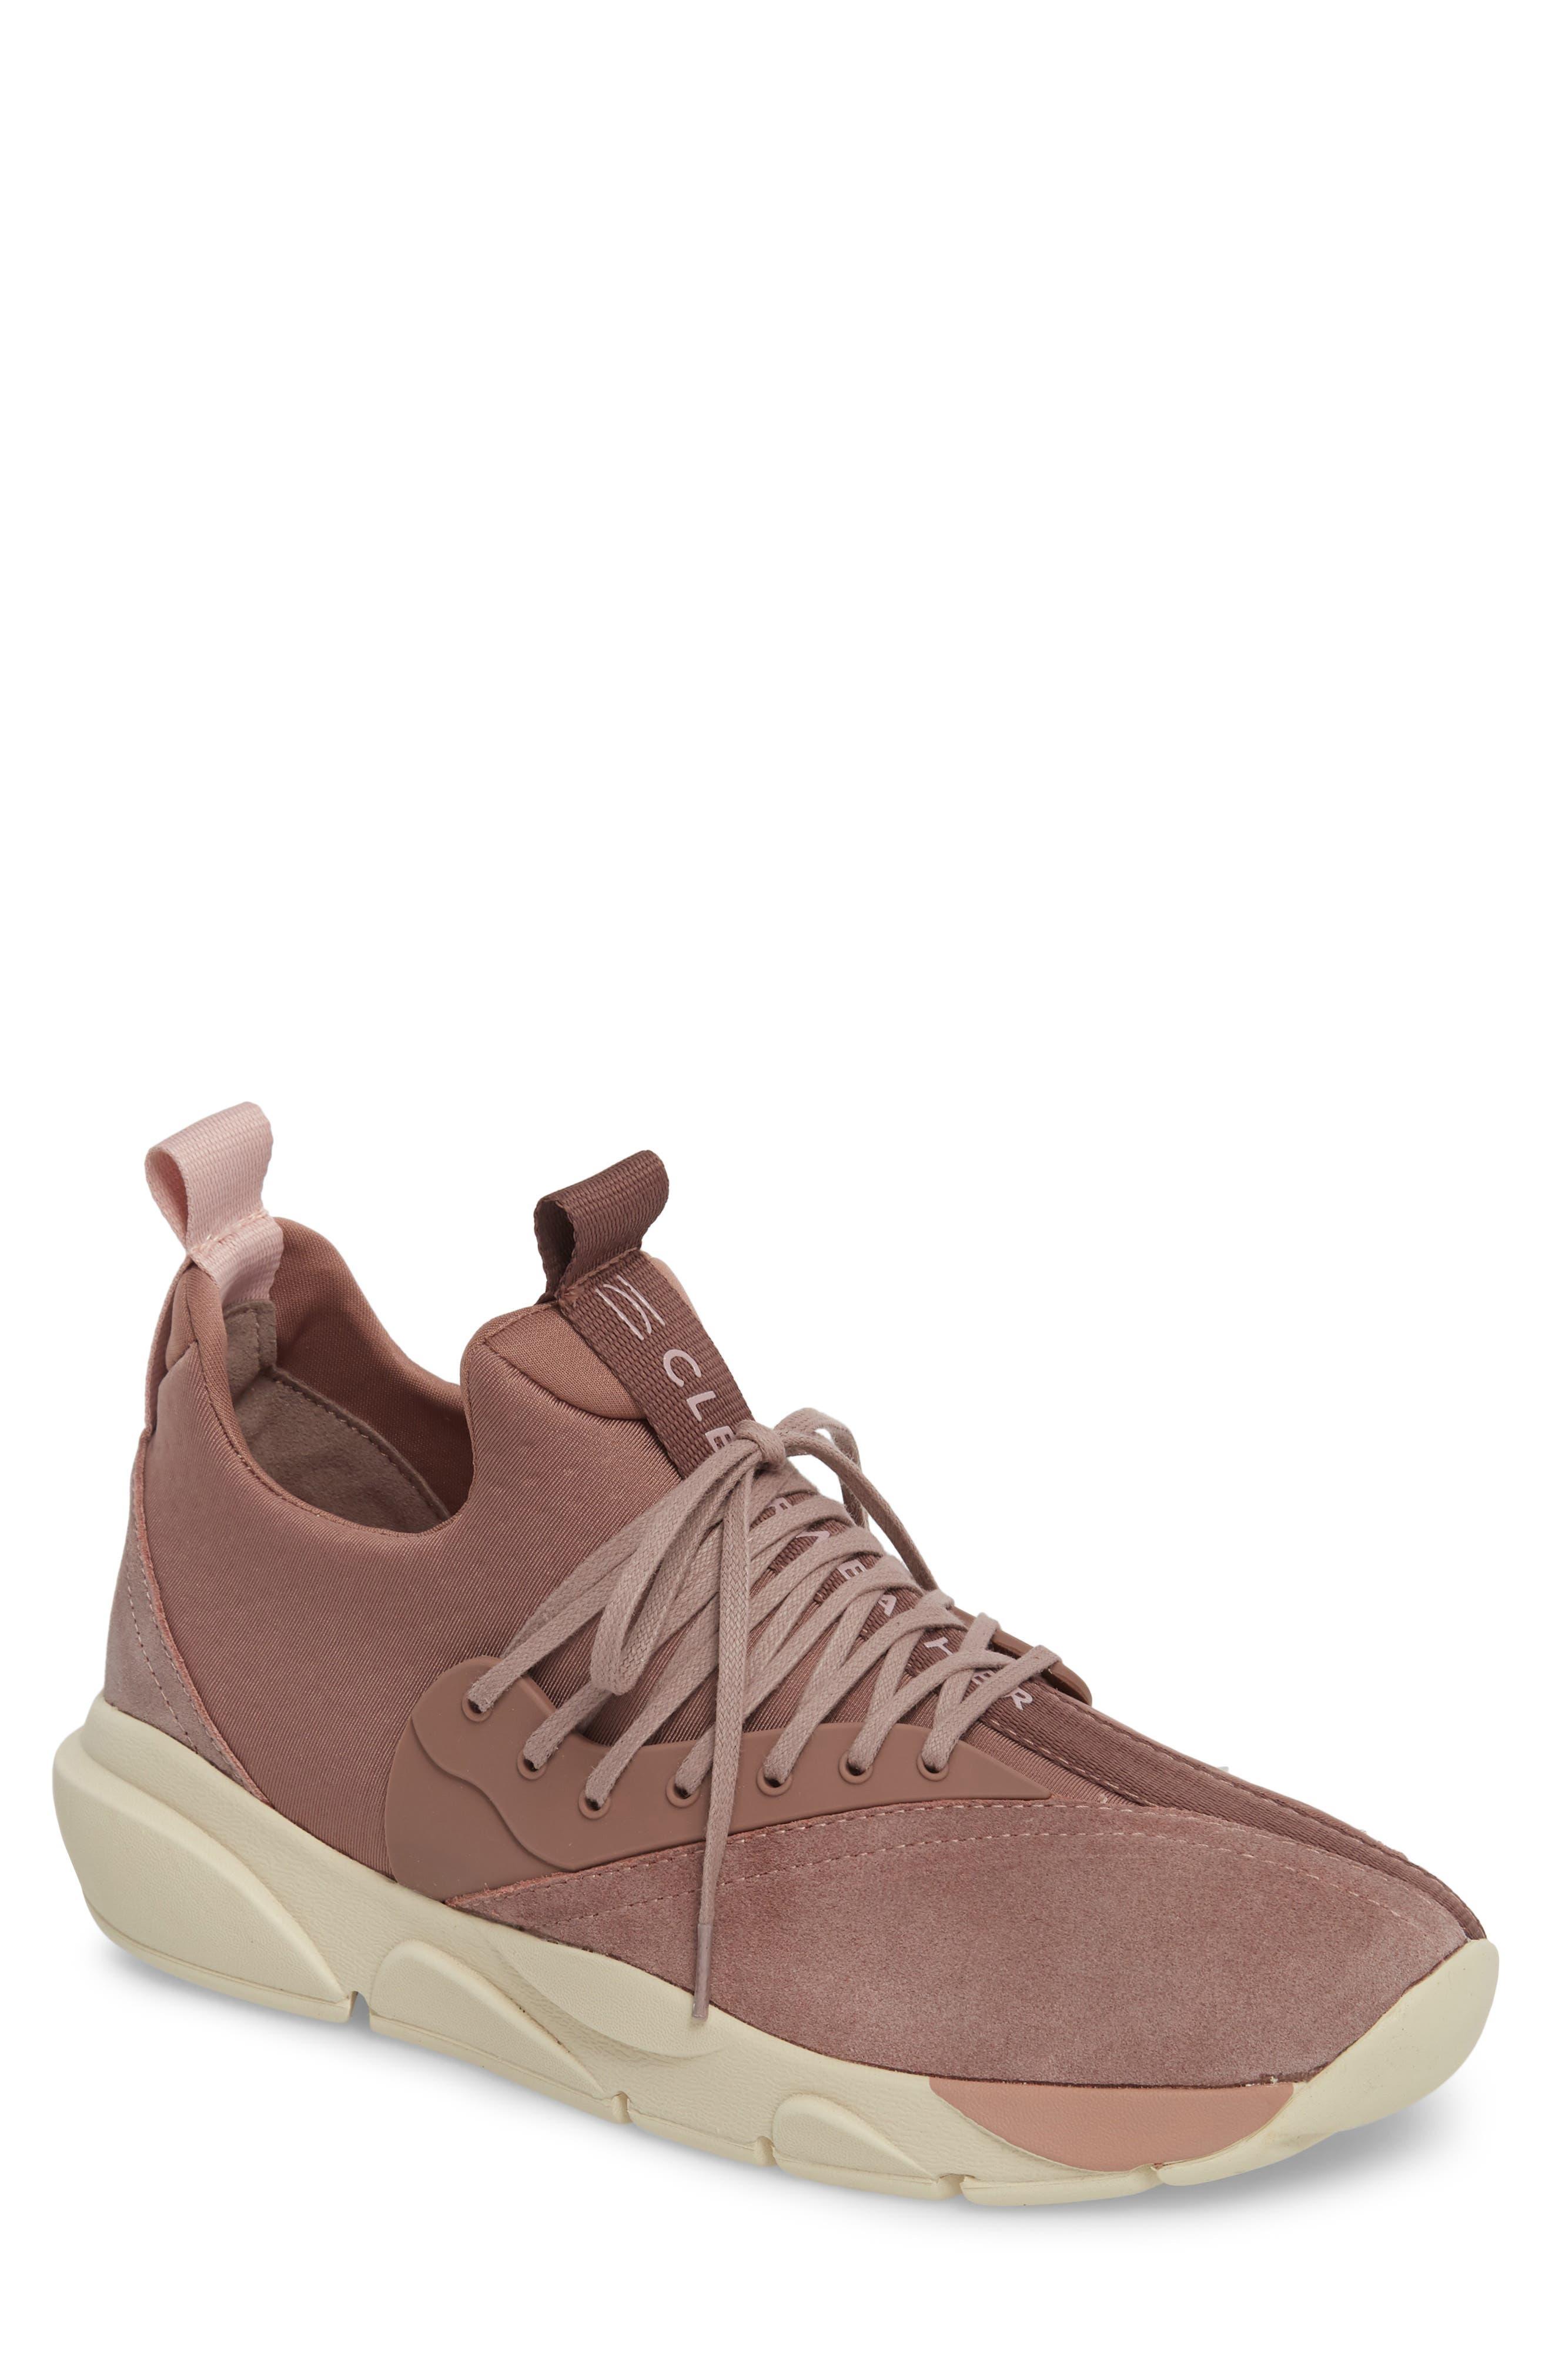 The Cloud Stryke Sneaker,                         Main,                         color, Antler Pink